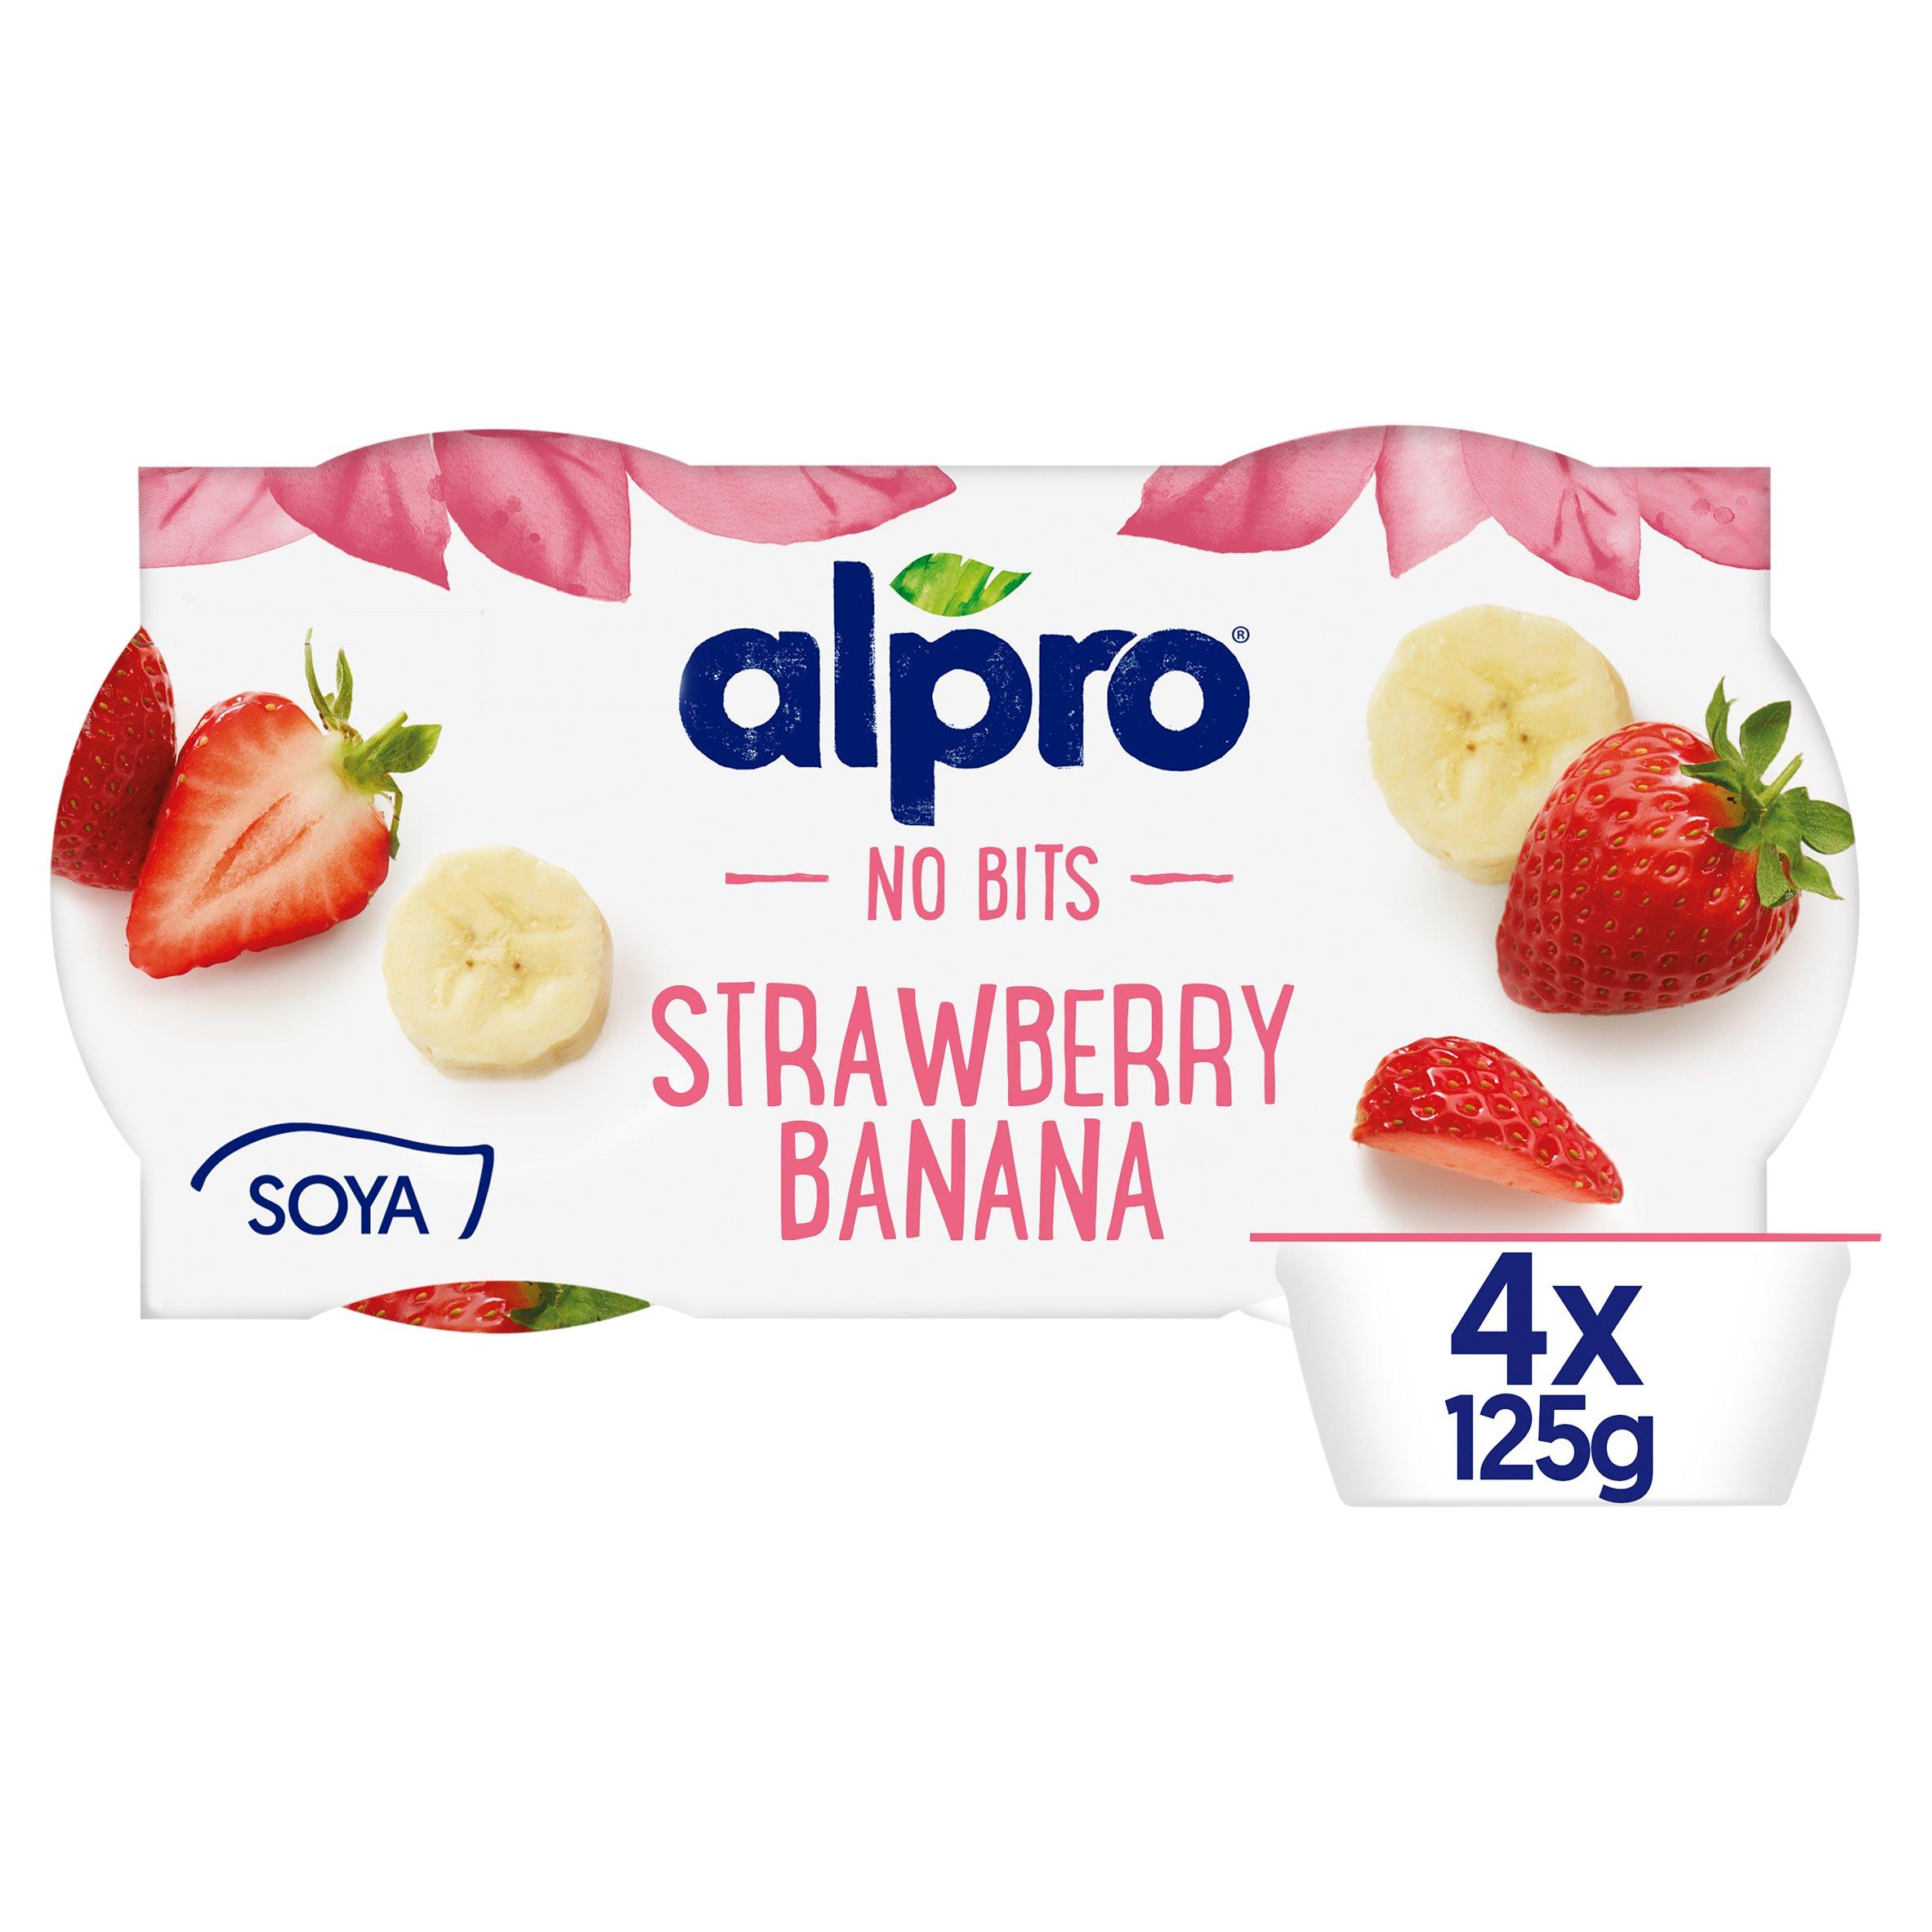 Alpro No Bits Strawberry Banana Yogurt Alternative 4X125g